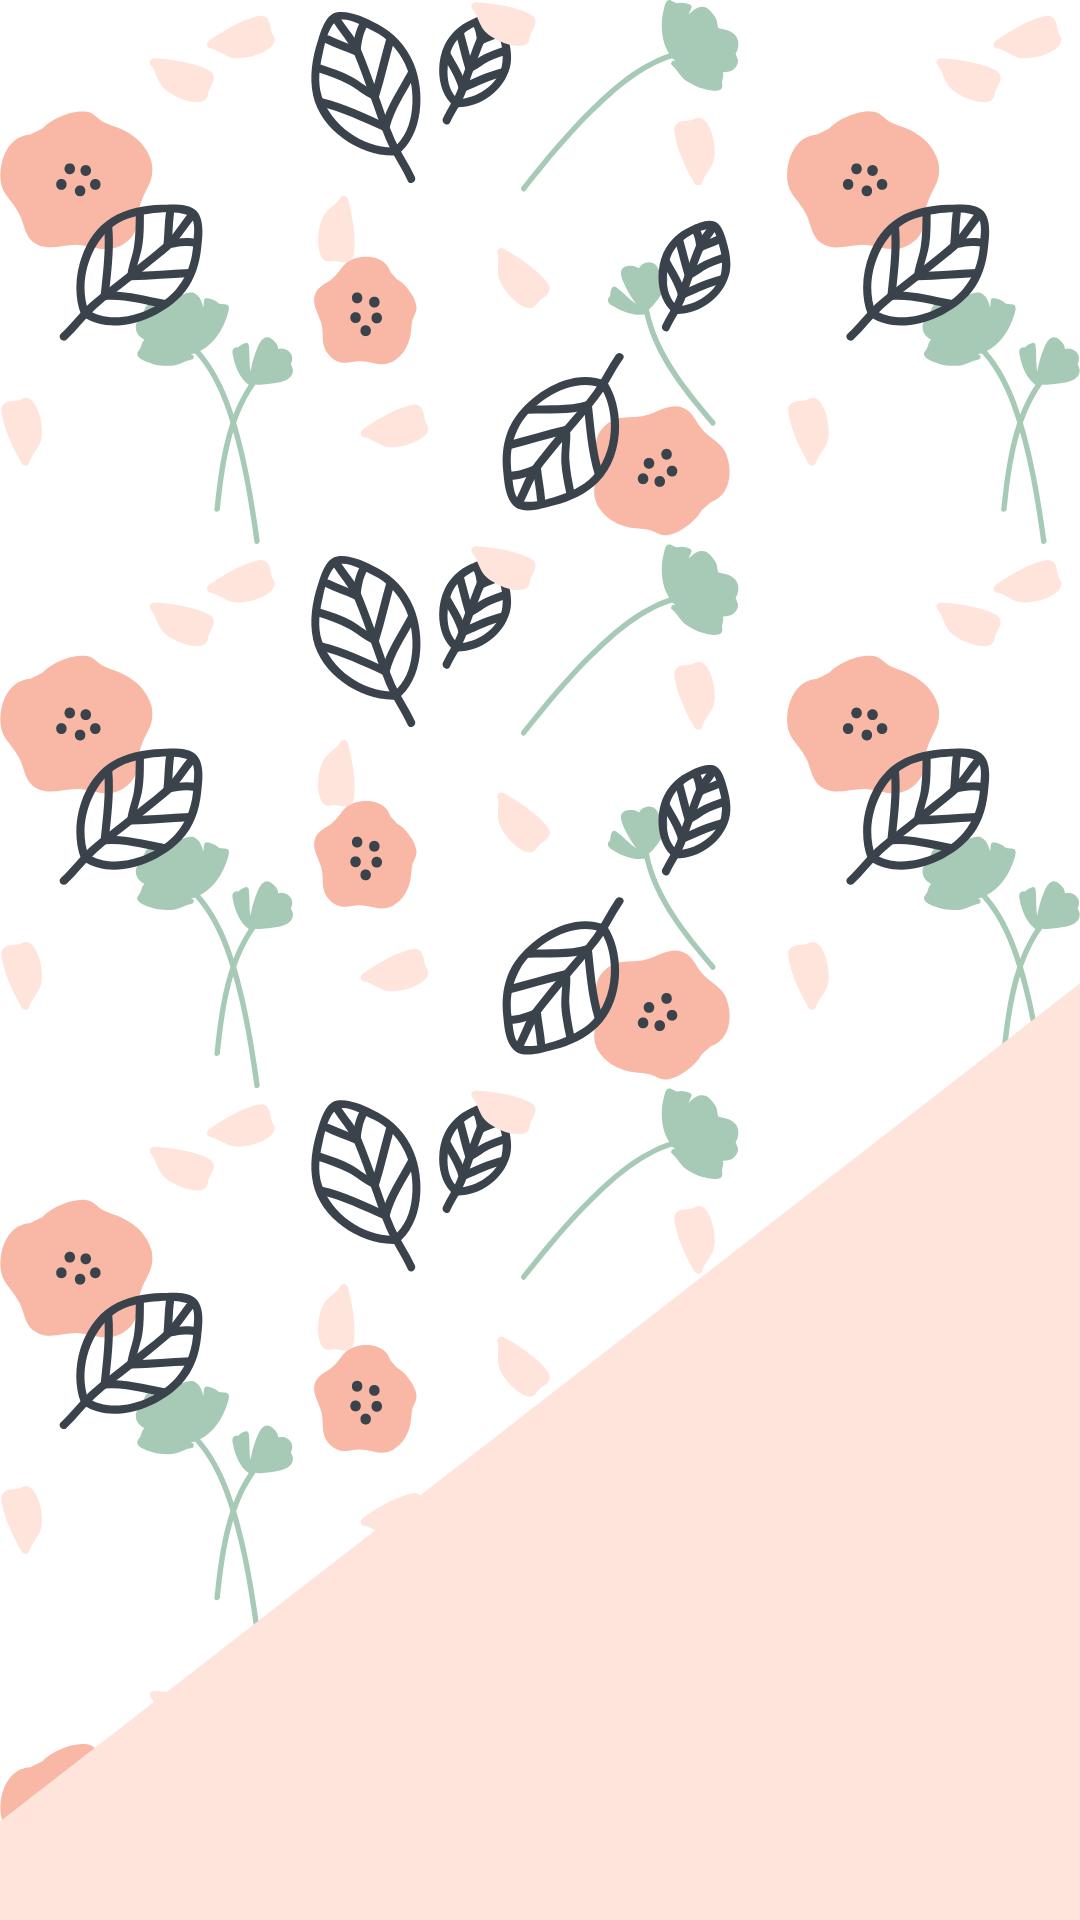 Phone Background Phone Wallpaper Patterns Pretty Wallpaper Iphone Flower Phone Wallpaper